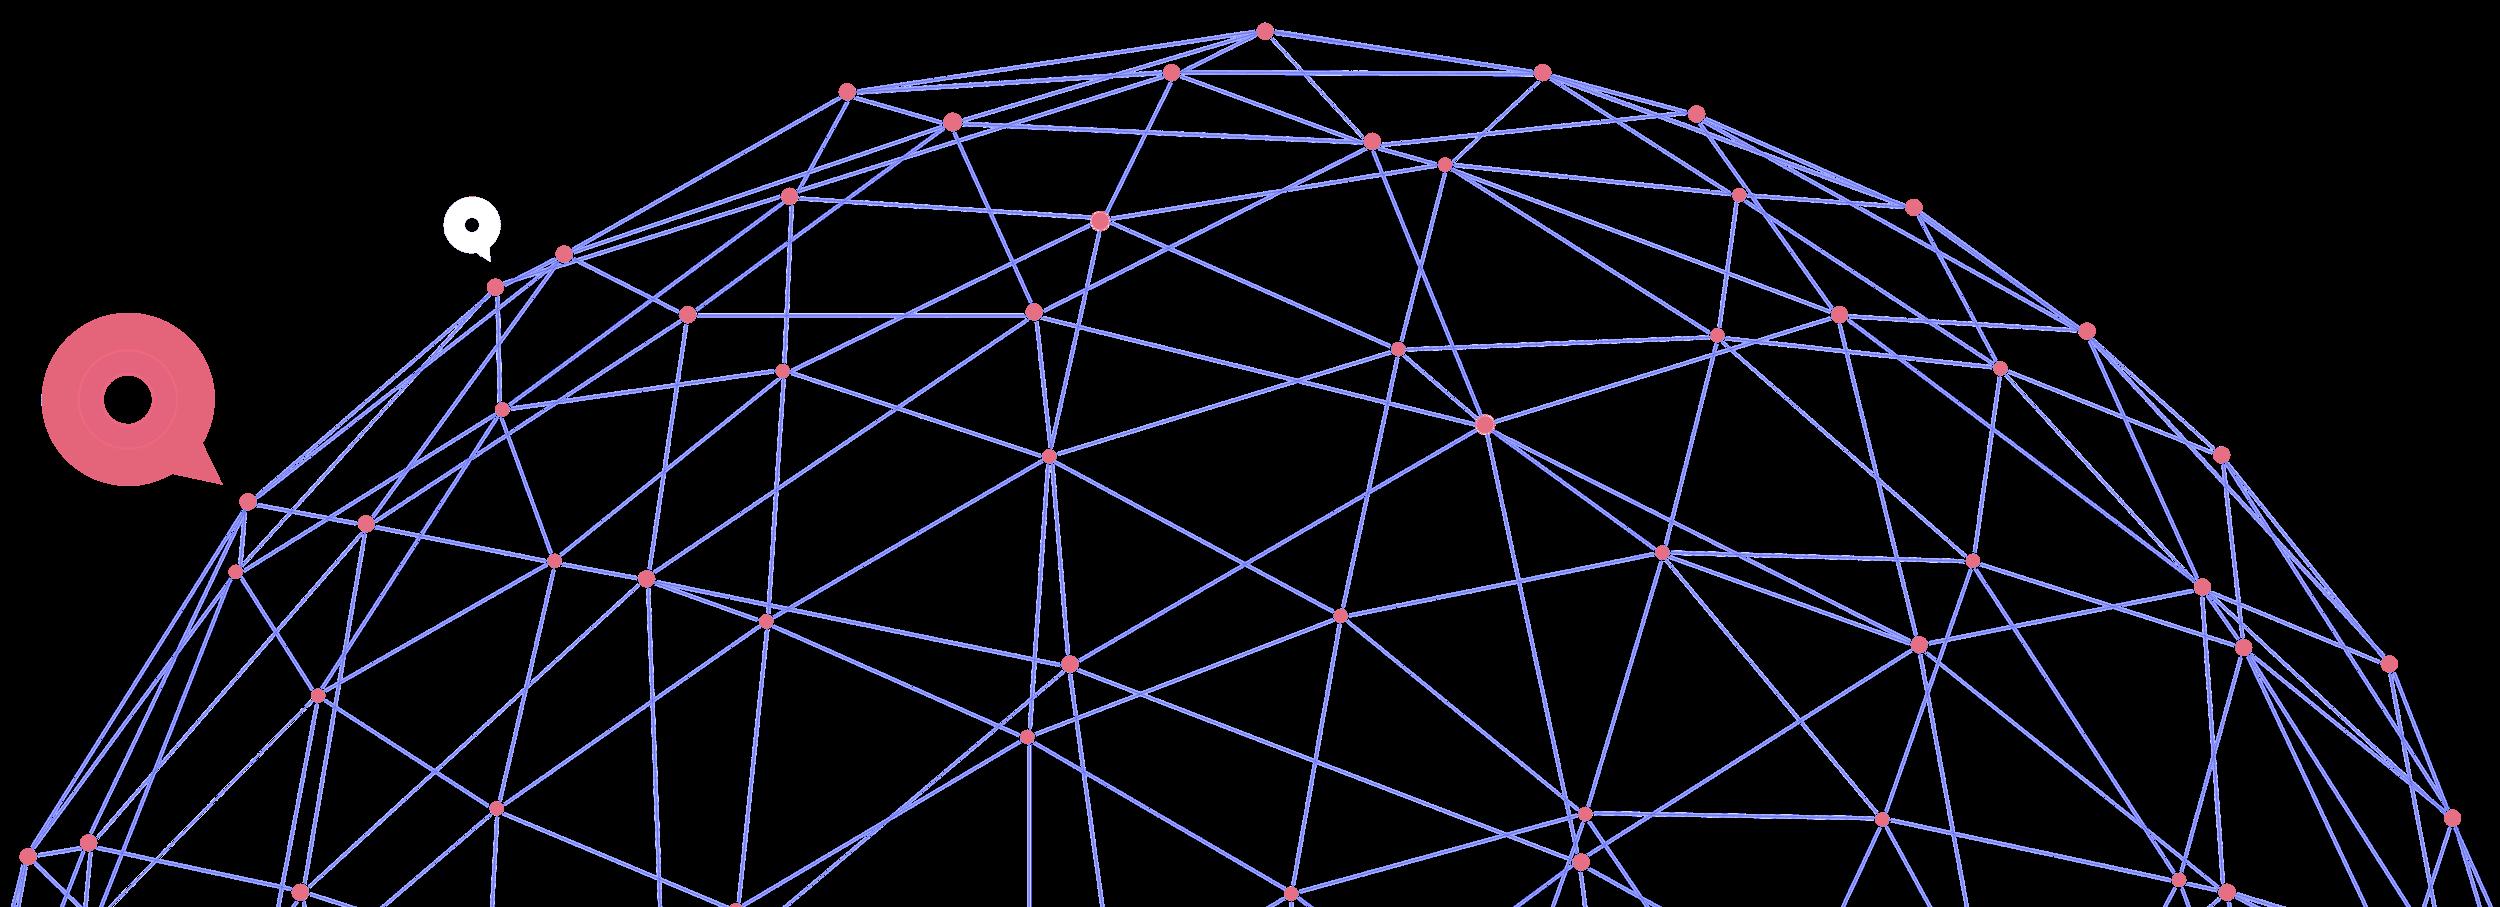 bg-pattern-top-din_